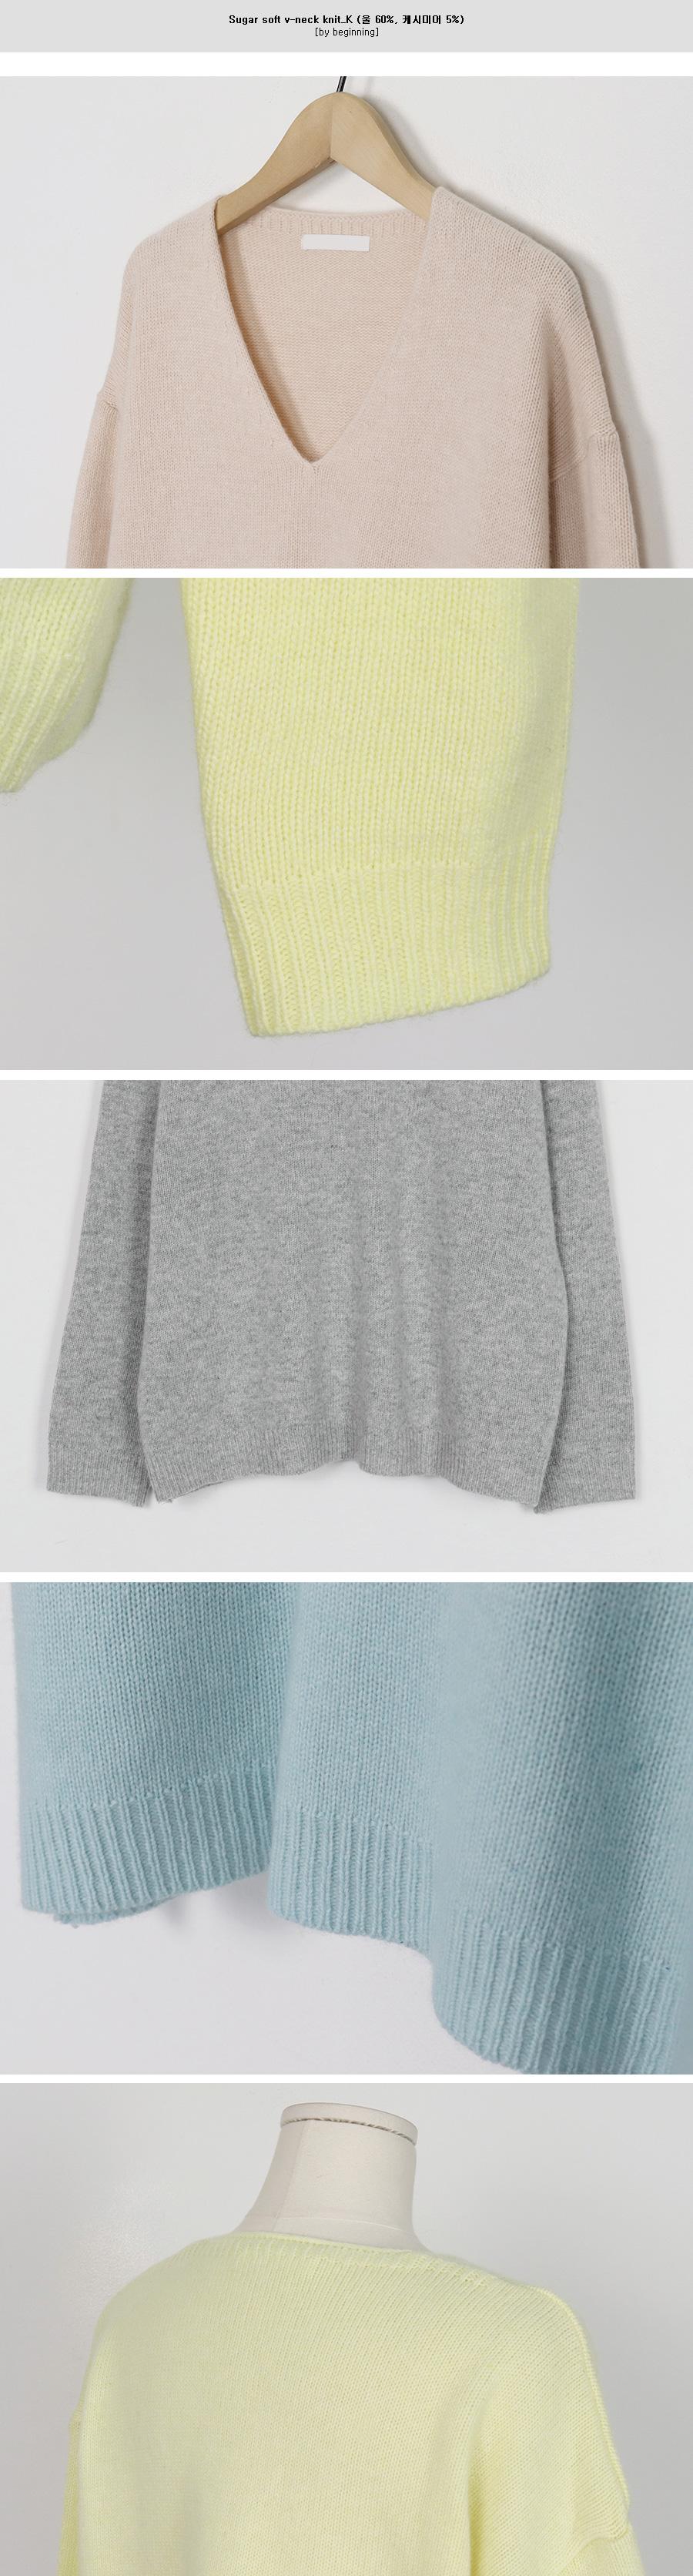 Sugar soft v-neck knit_K (울 60%, 캐시미어 5%) (size : free)